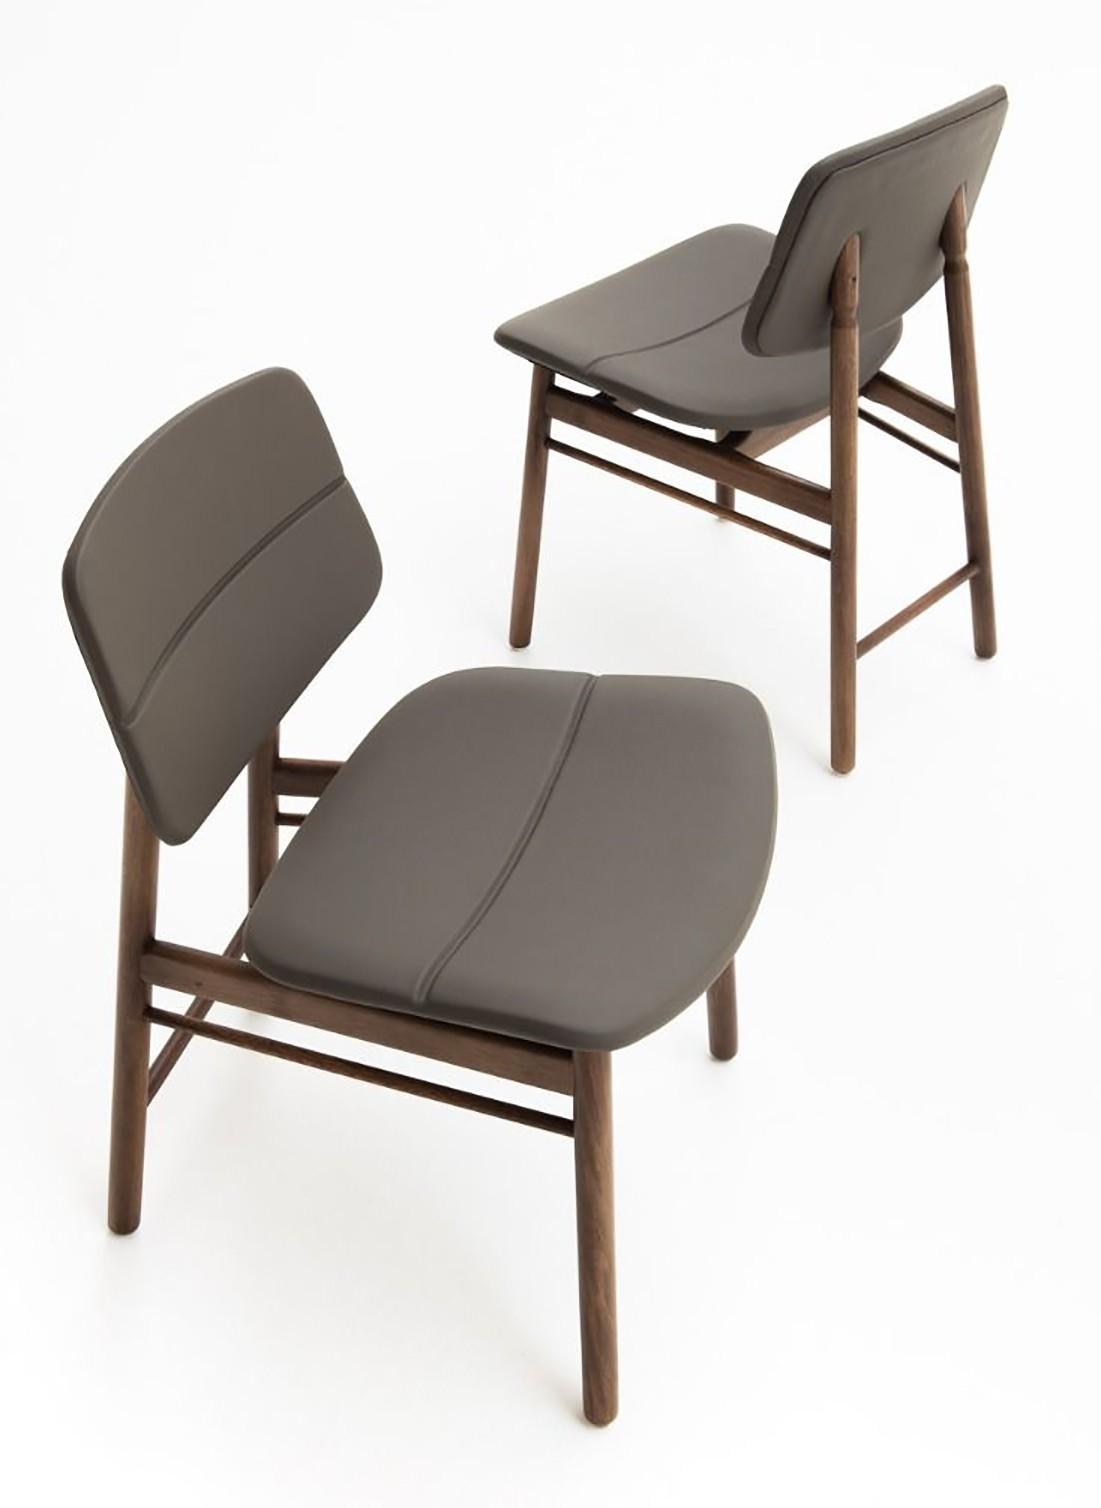 Cadeira Cris · estudiobola